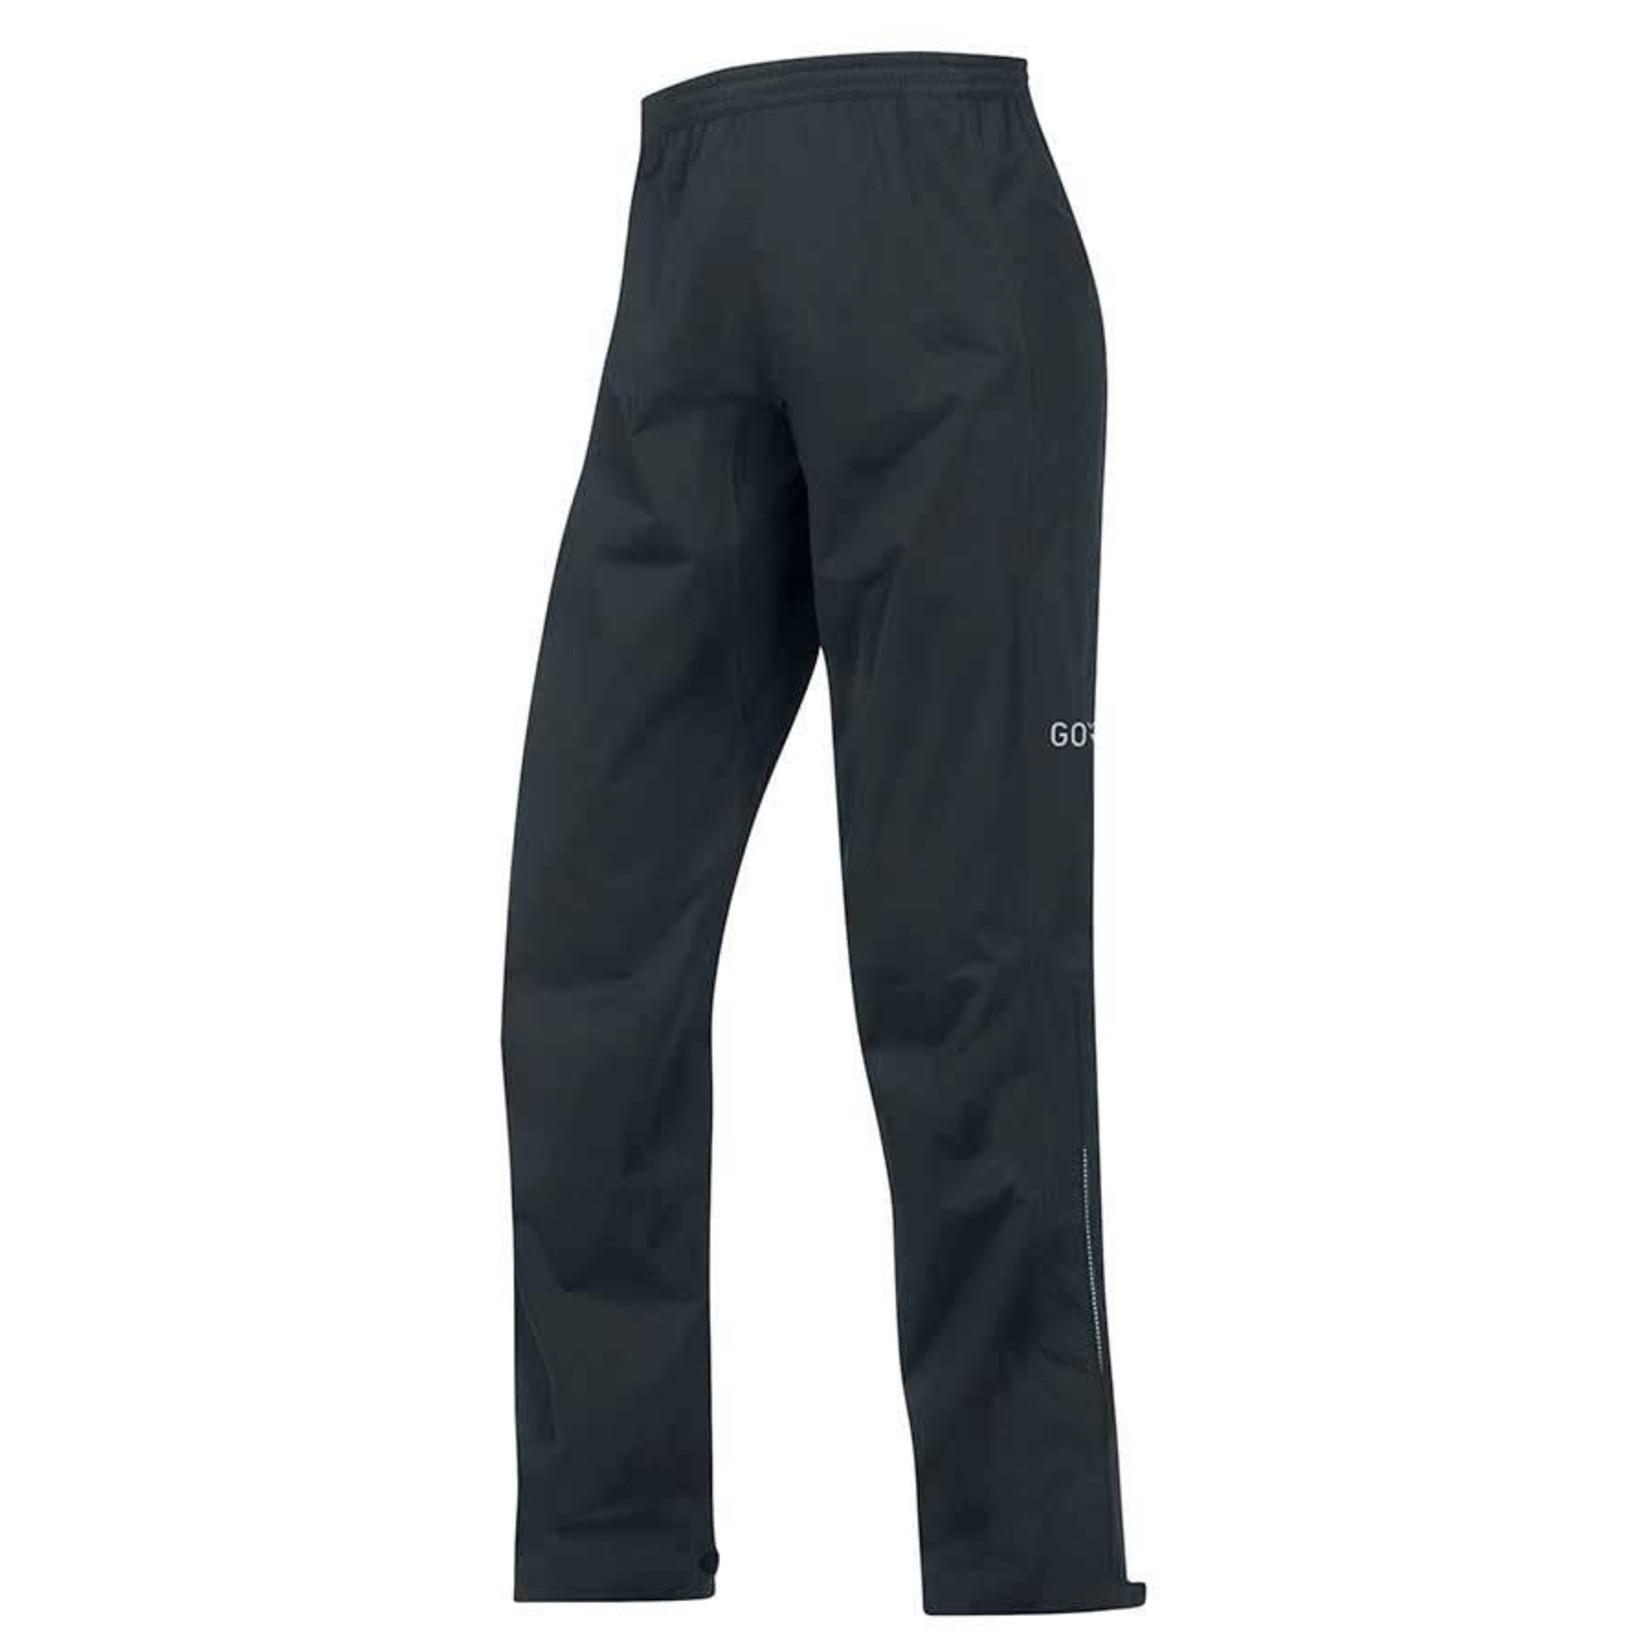 Gore Wear Gore Wear C3 Gore-Tex Active Rain Pants